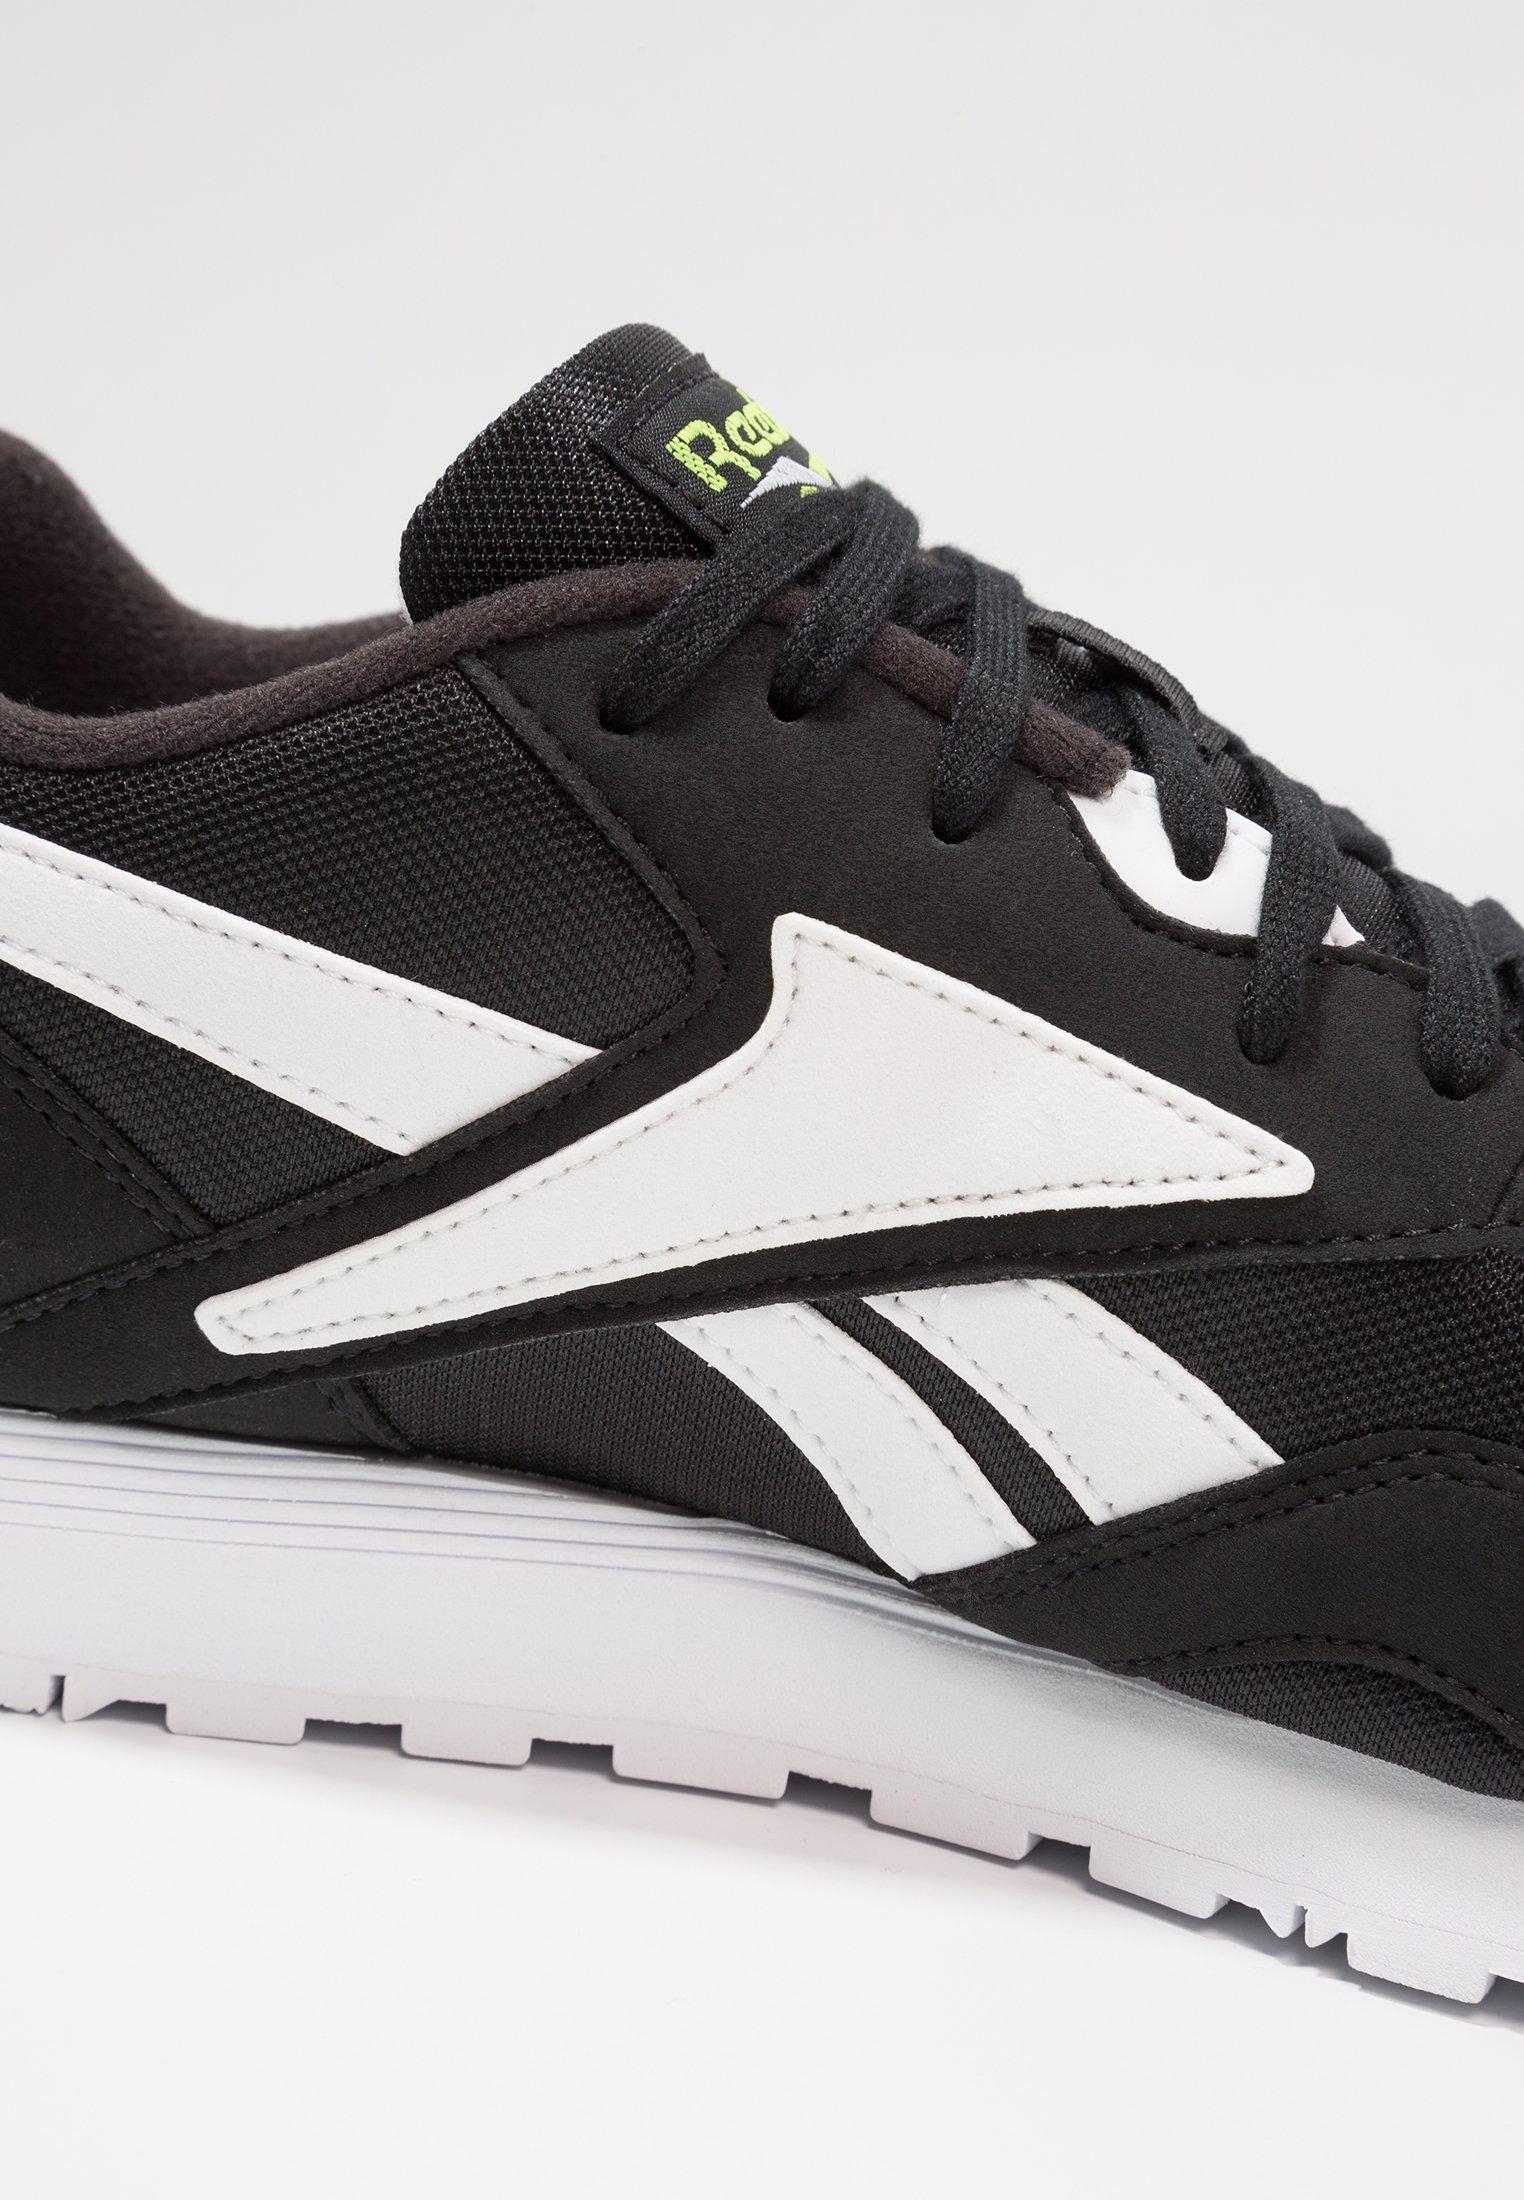 Reebok Classic Rapide - Sneakers Laag Black/white/solar Yellow Goedkope Schoenen